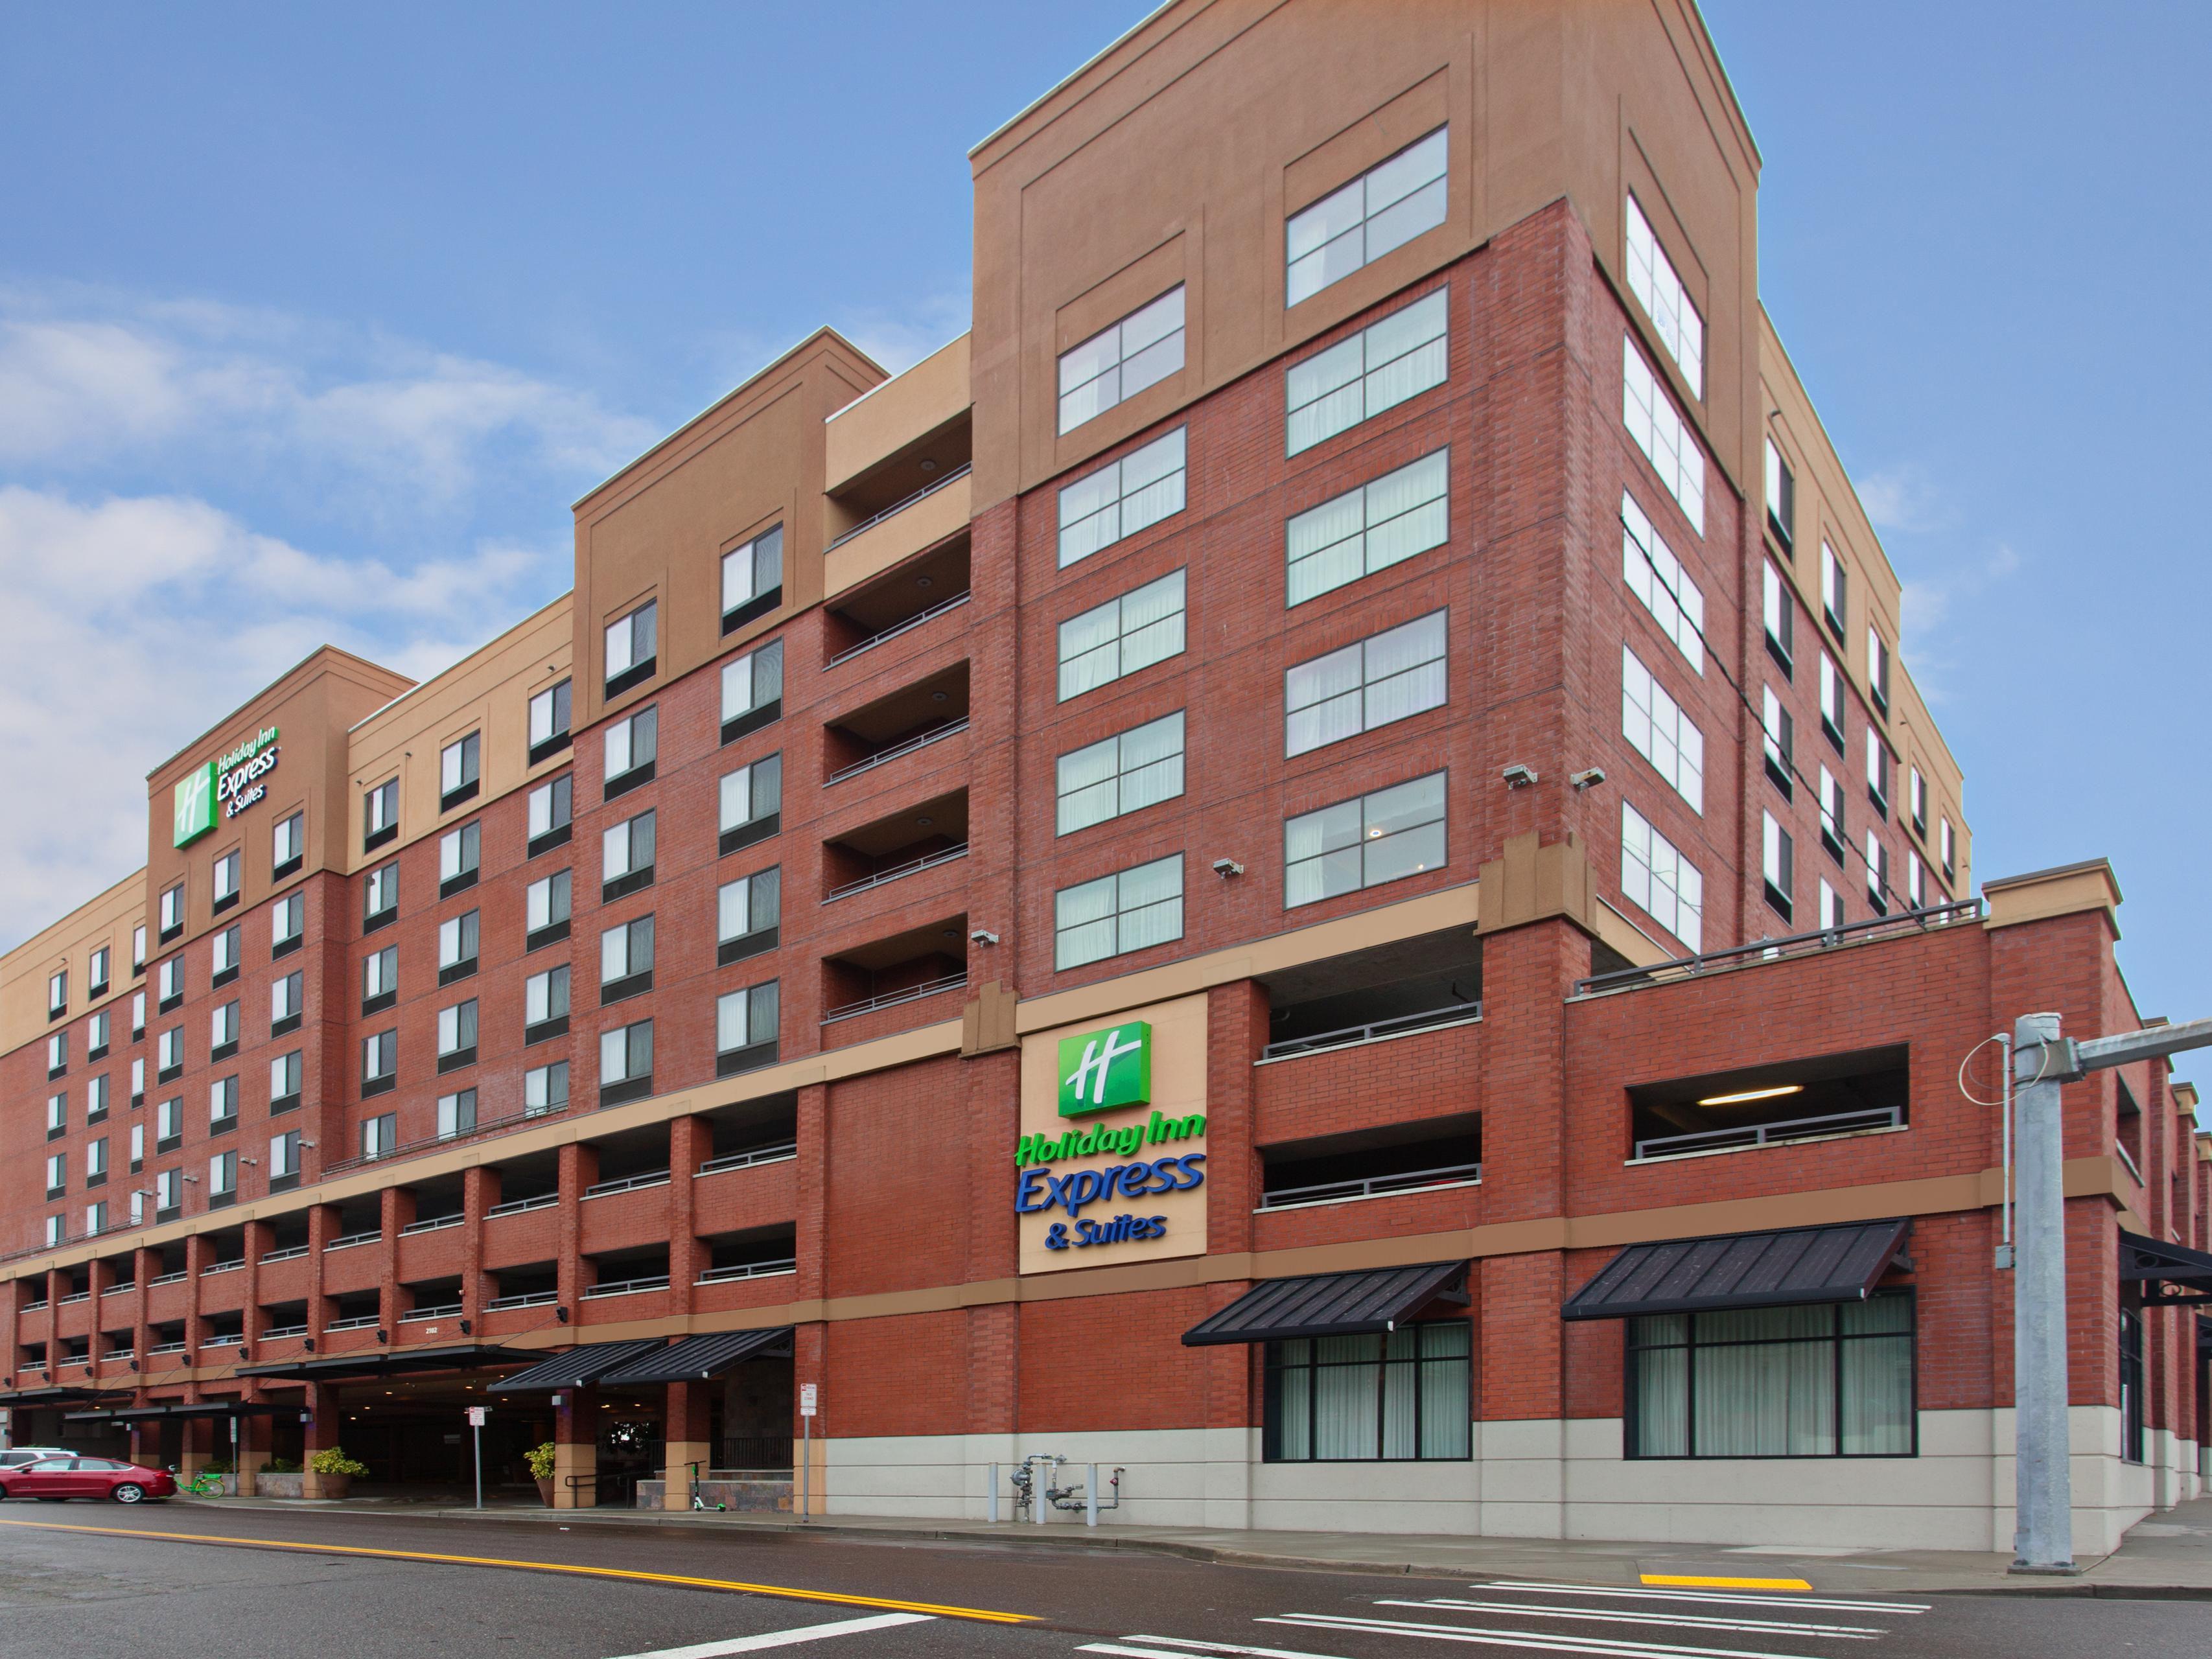 Hotels Near Tacoma Dome in Tacoma, Washington